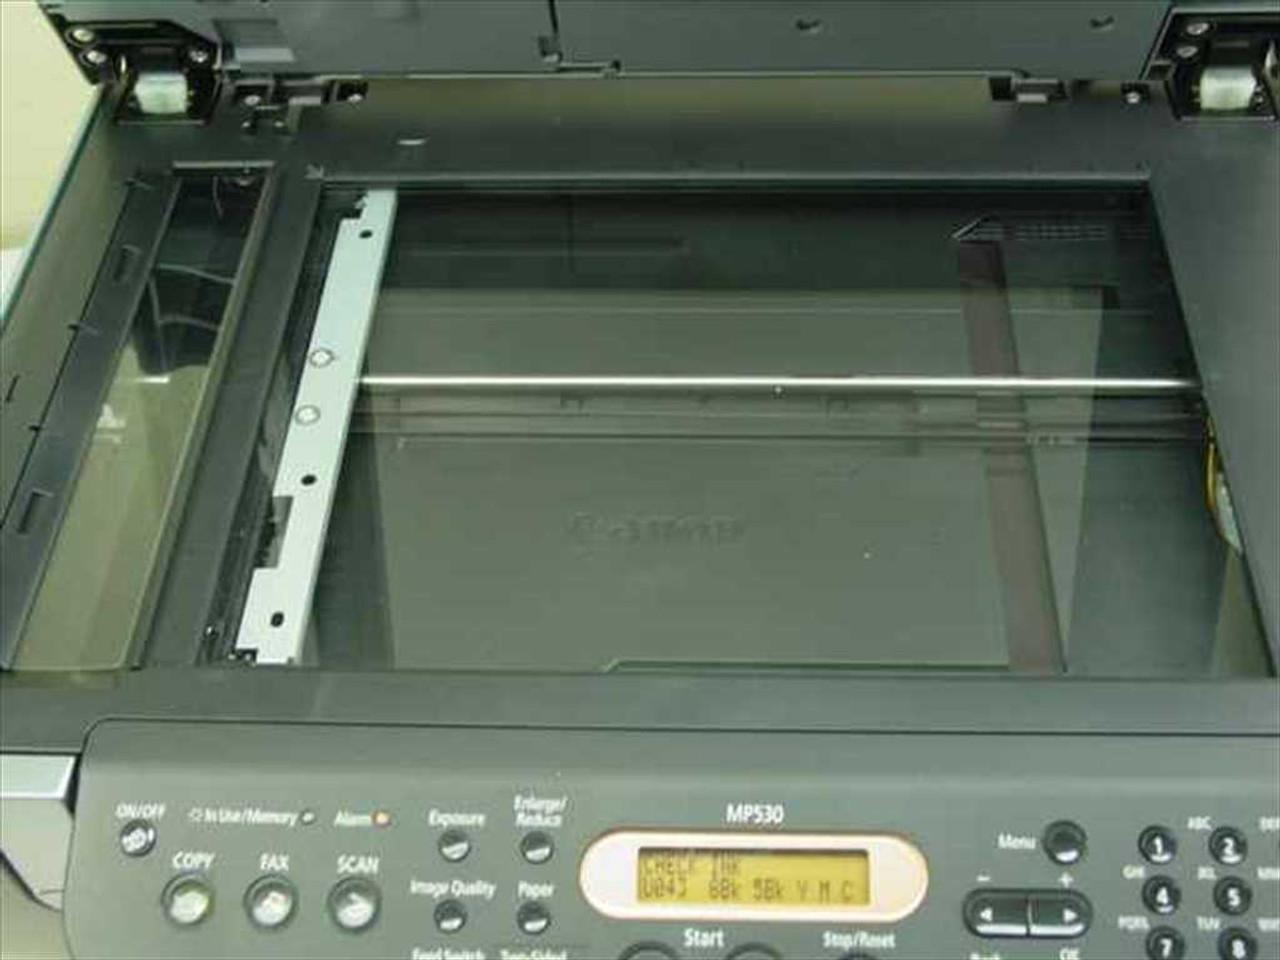 CANON MP530 SCAN DRIVERS FOR WINDOWS VISTA